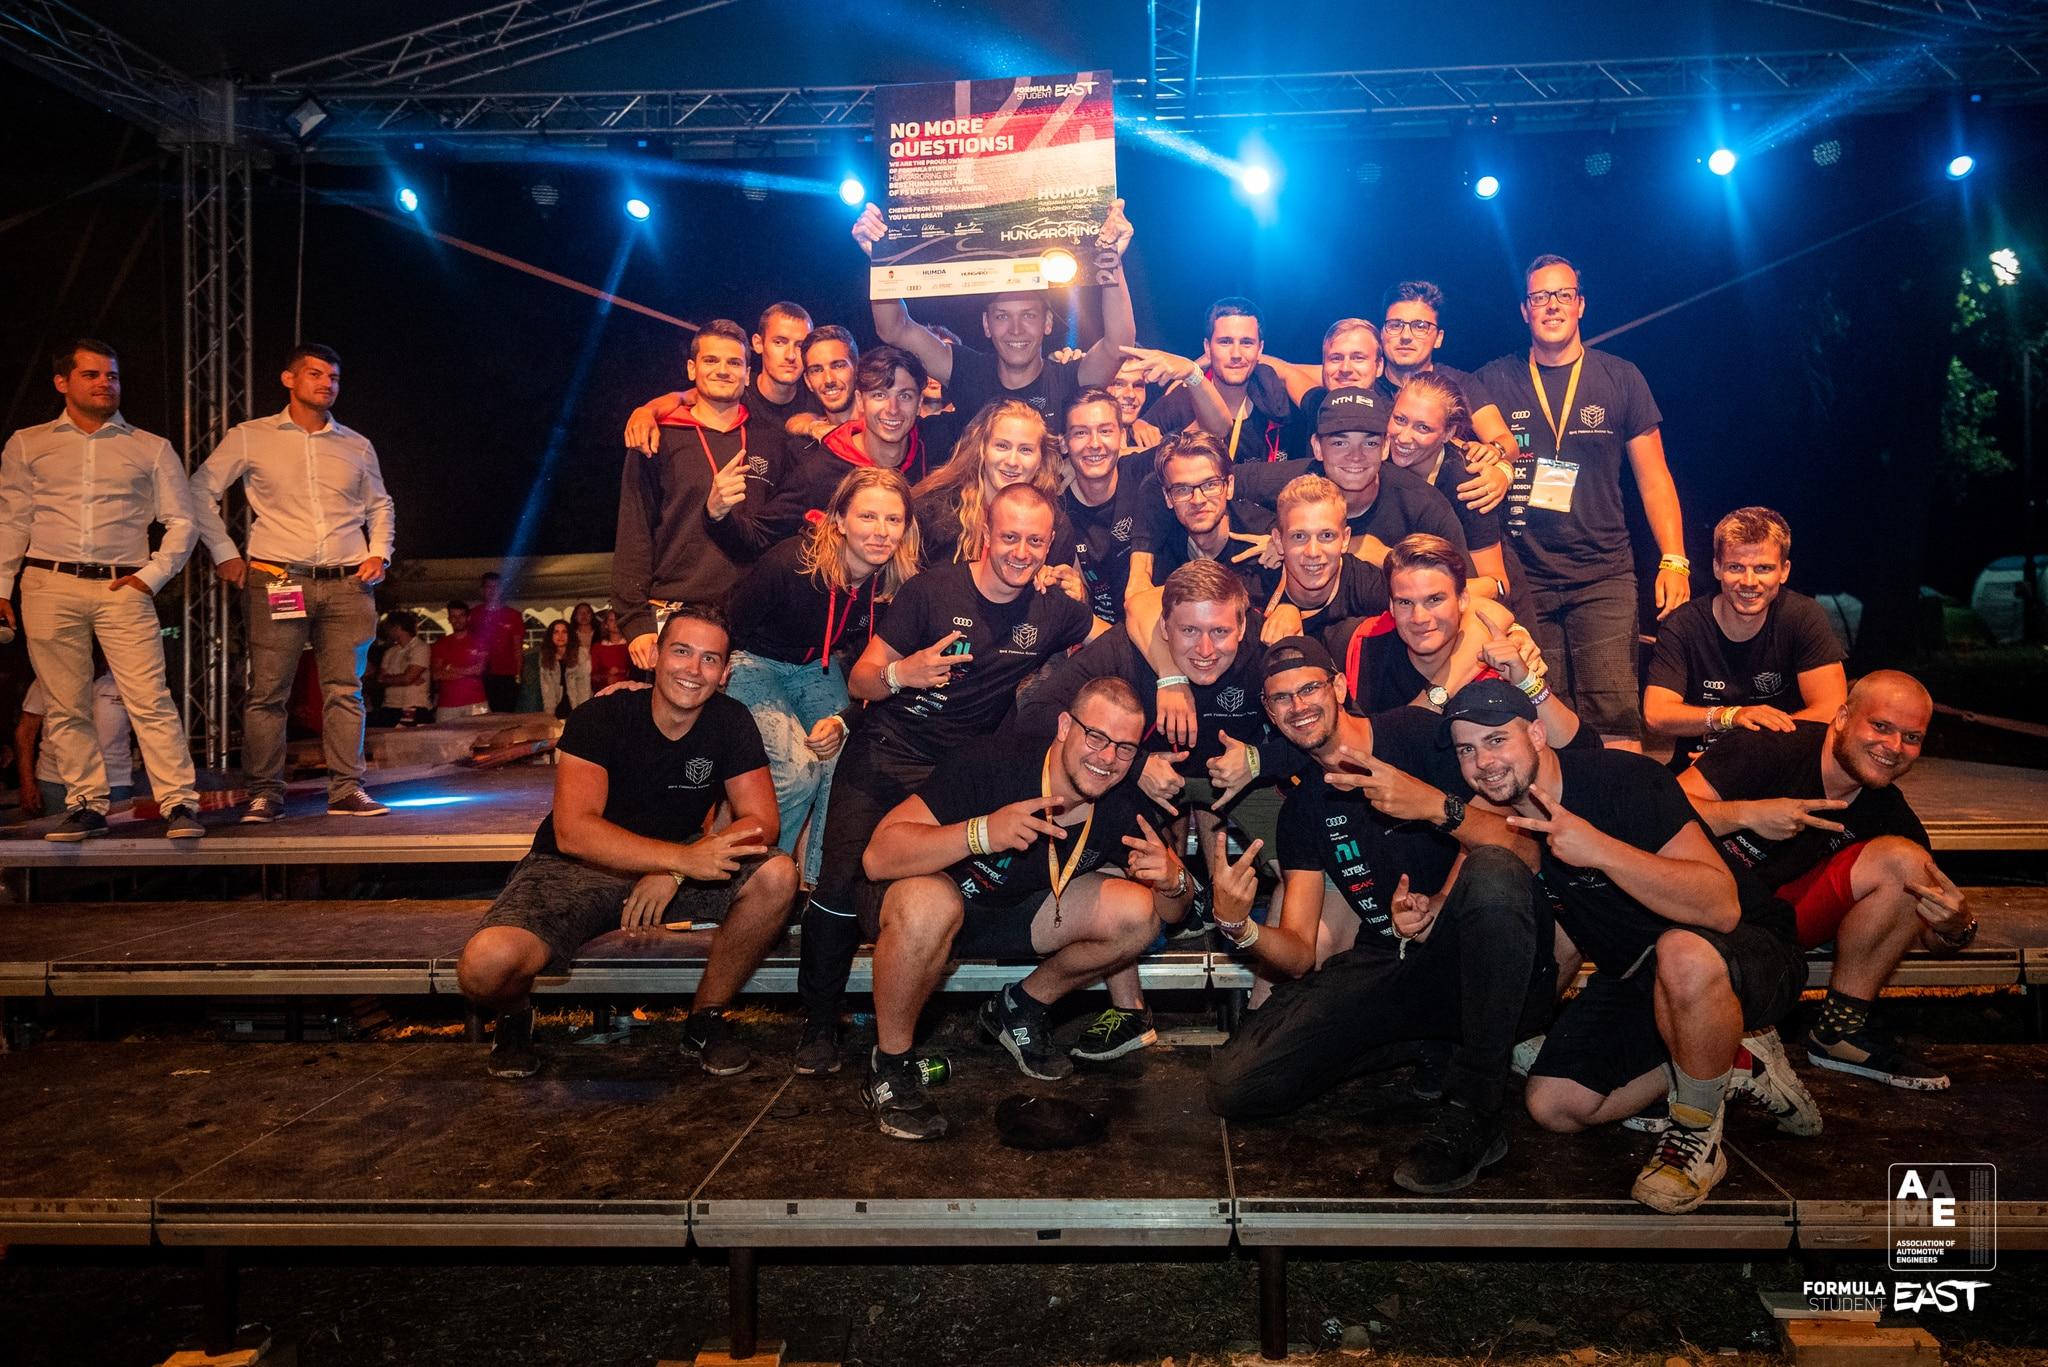 Hungaroring & HUMDA - Best Hungarian Team of FS East Special Award WINNER: BME Formula Racing Team